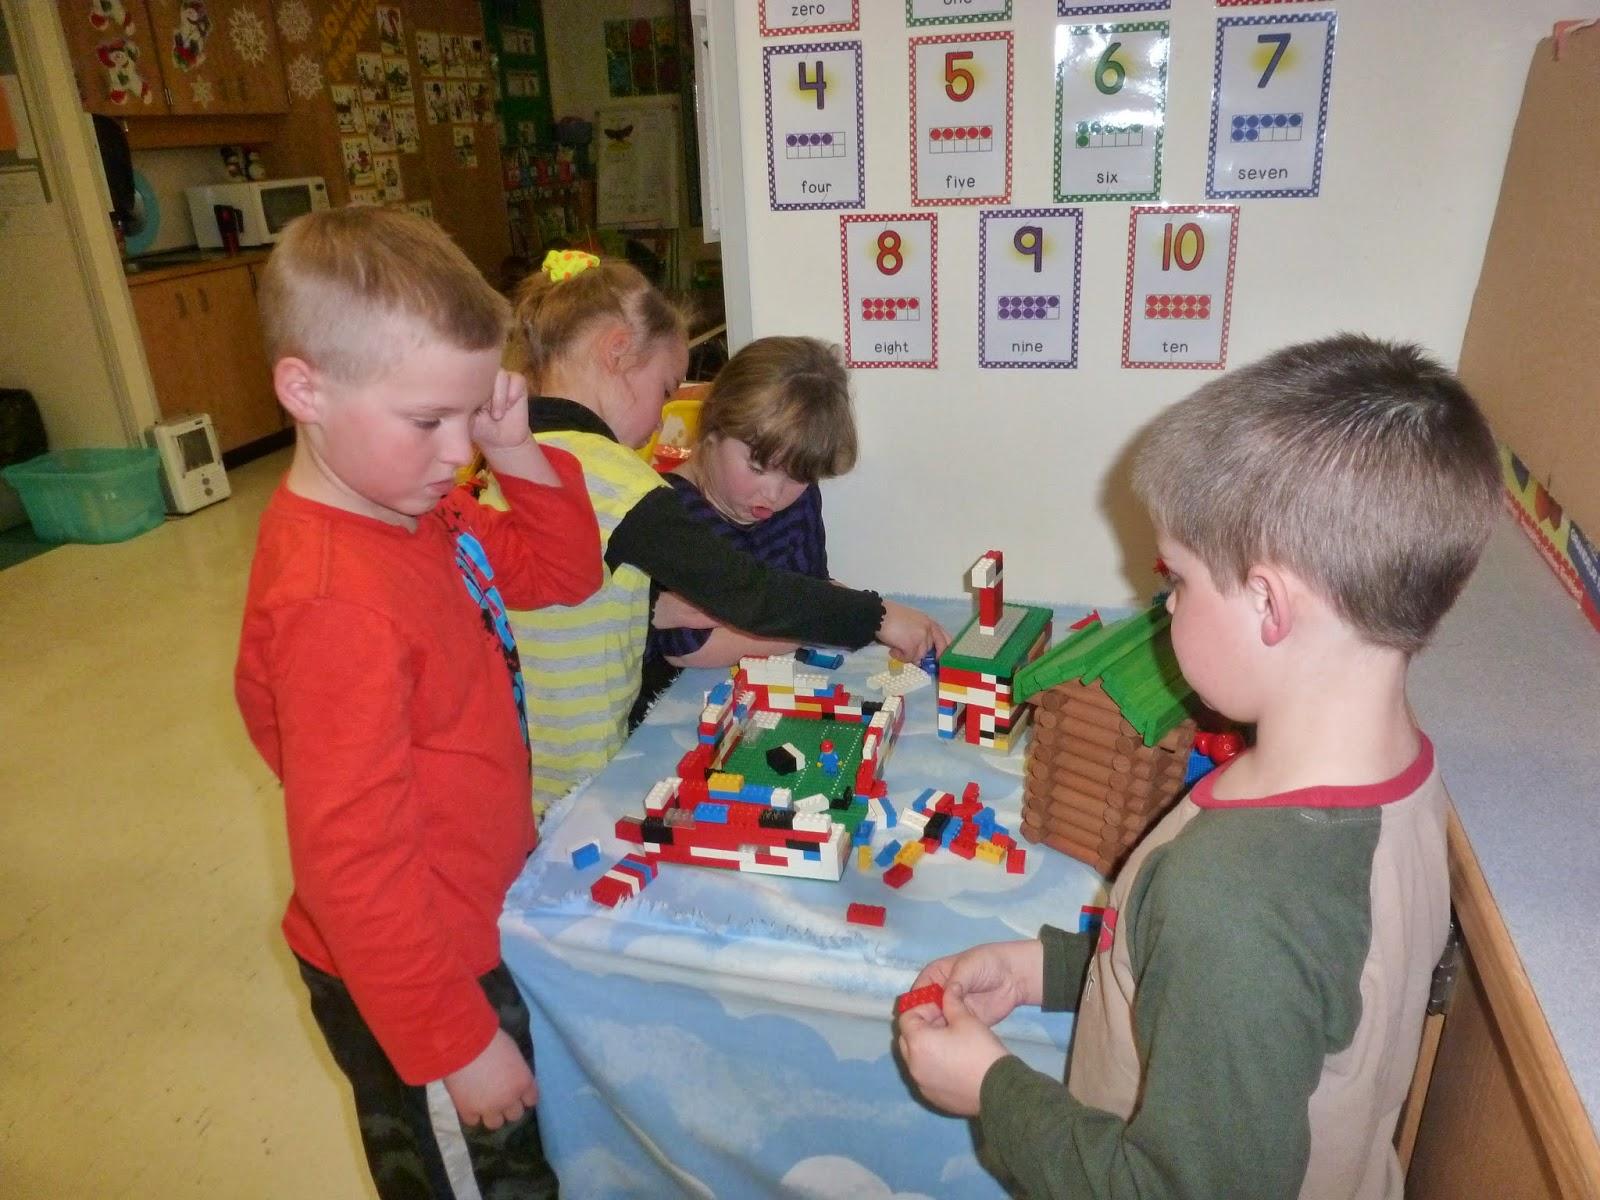 Miss Vanchu S Classroom Blog The Three Little Pigs